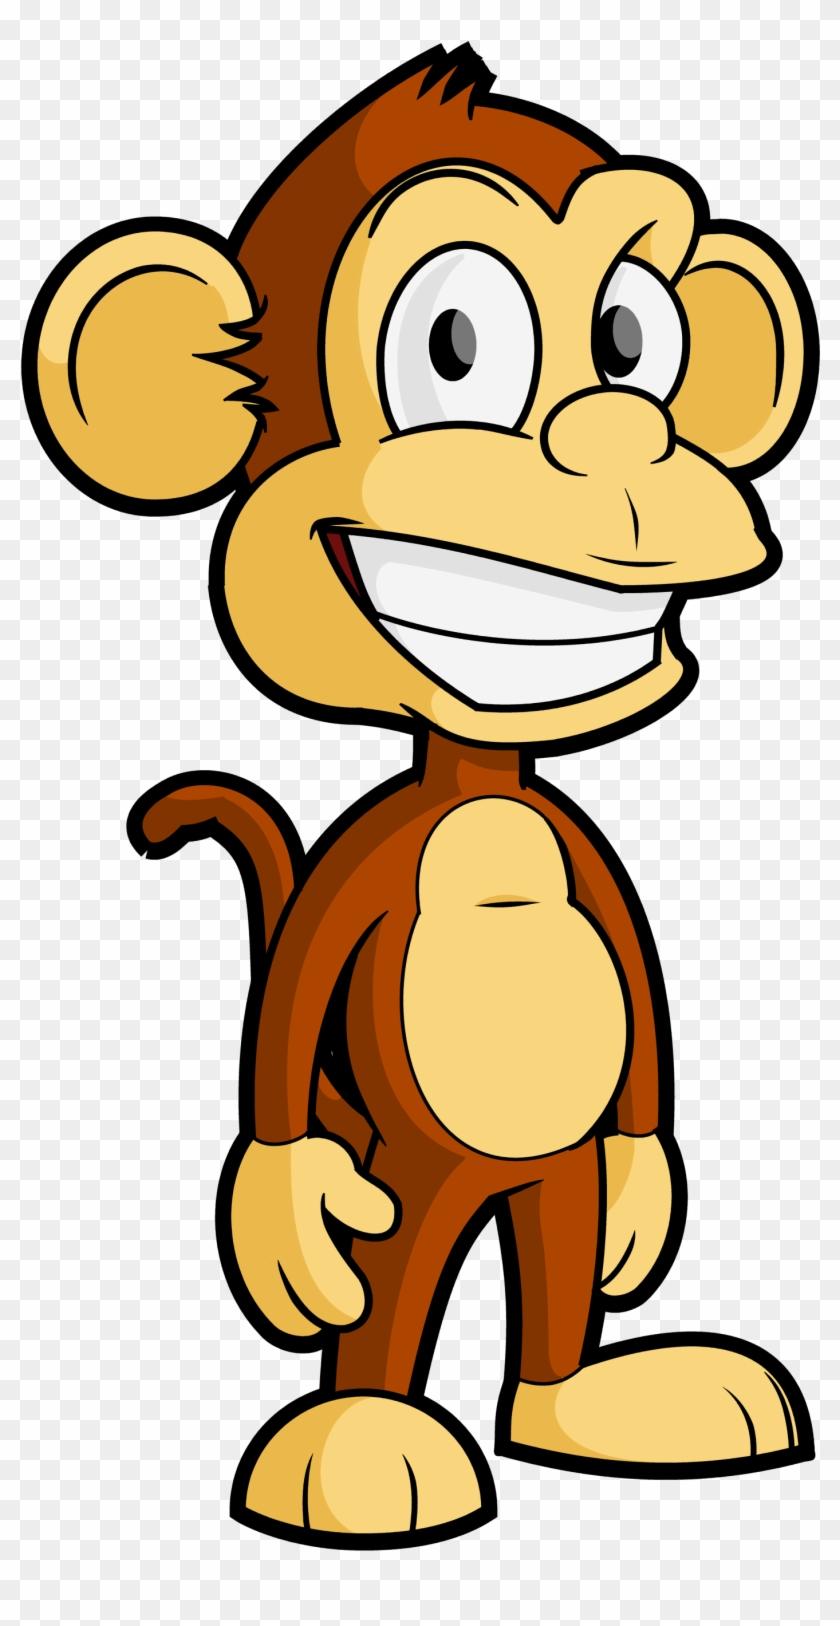 Free Cartoon Monkey Vector Clip Art - Monkey Vector Png #17815